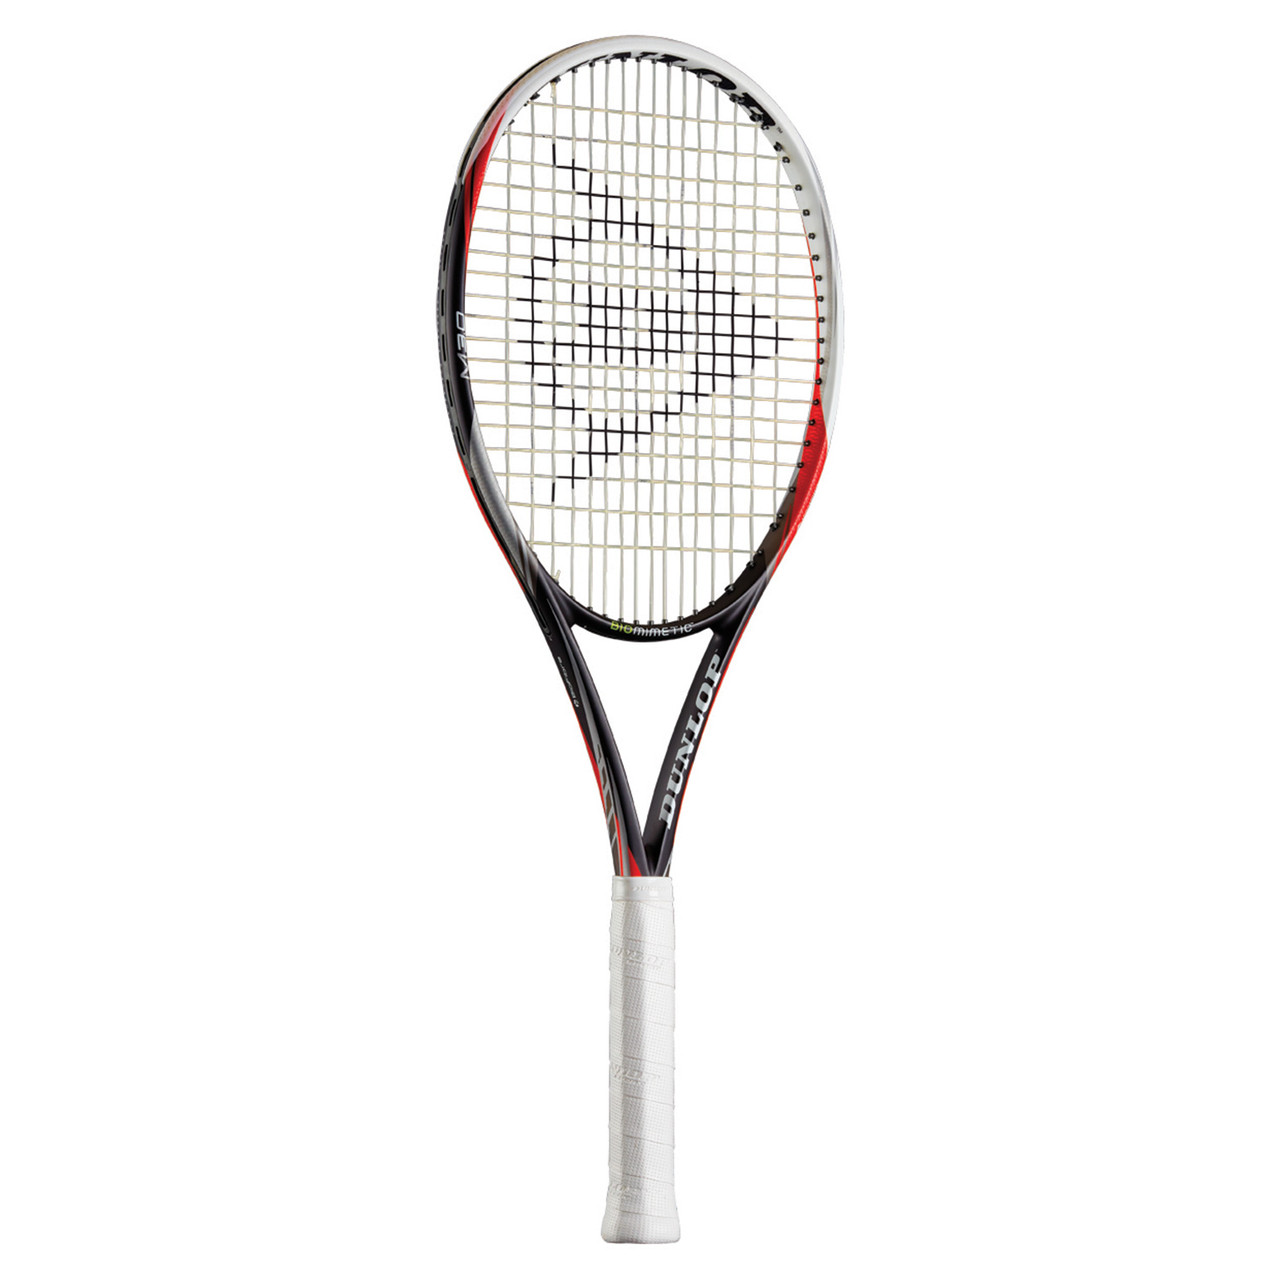 Теннисная ракетка Dunlop D Tr Biomimetic M3.0 G4 Hl 676234-NC